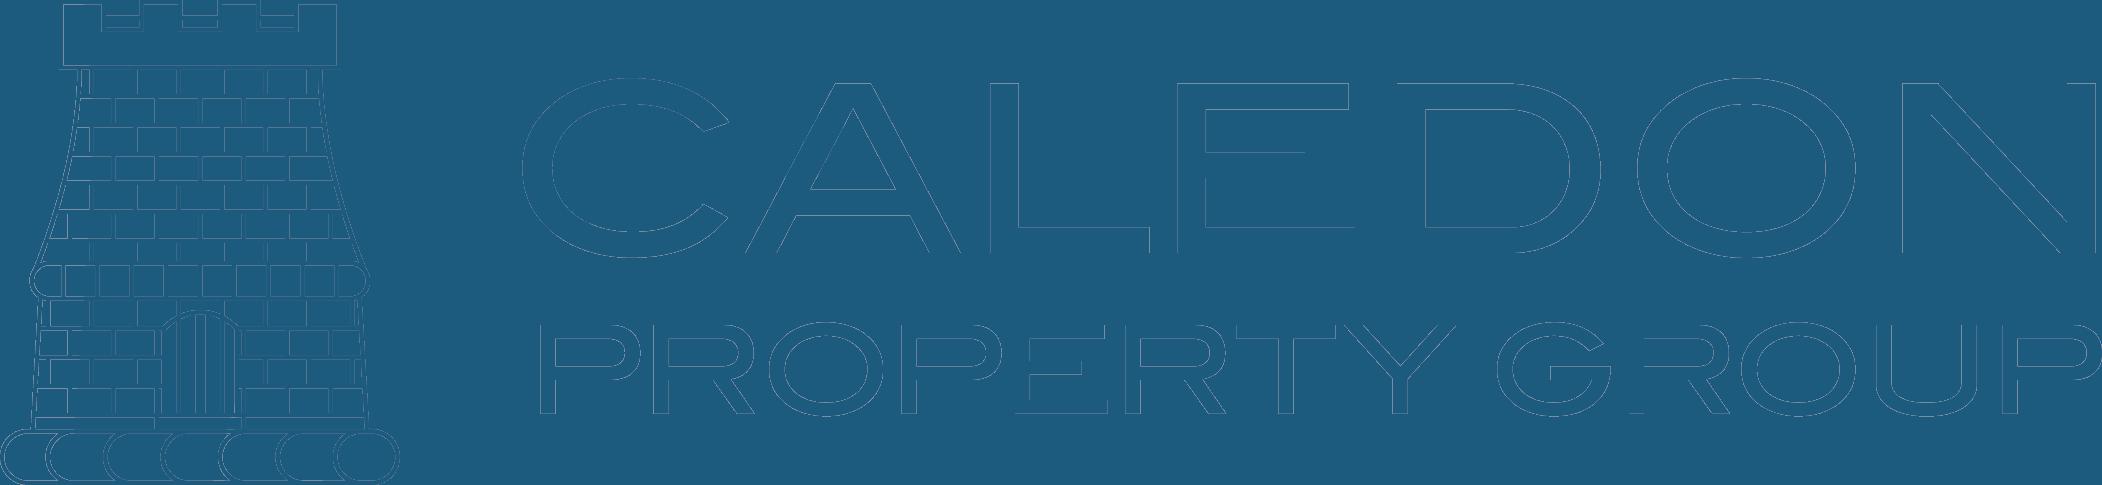 Caledon Property Group